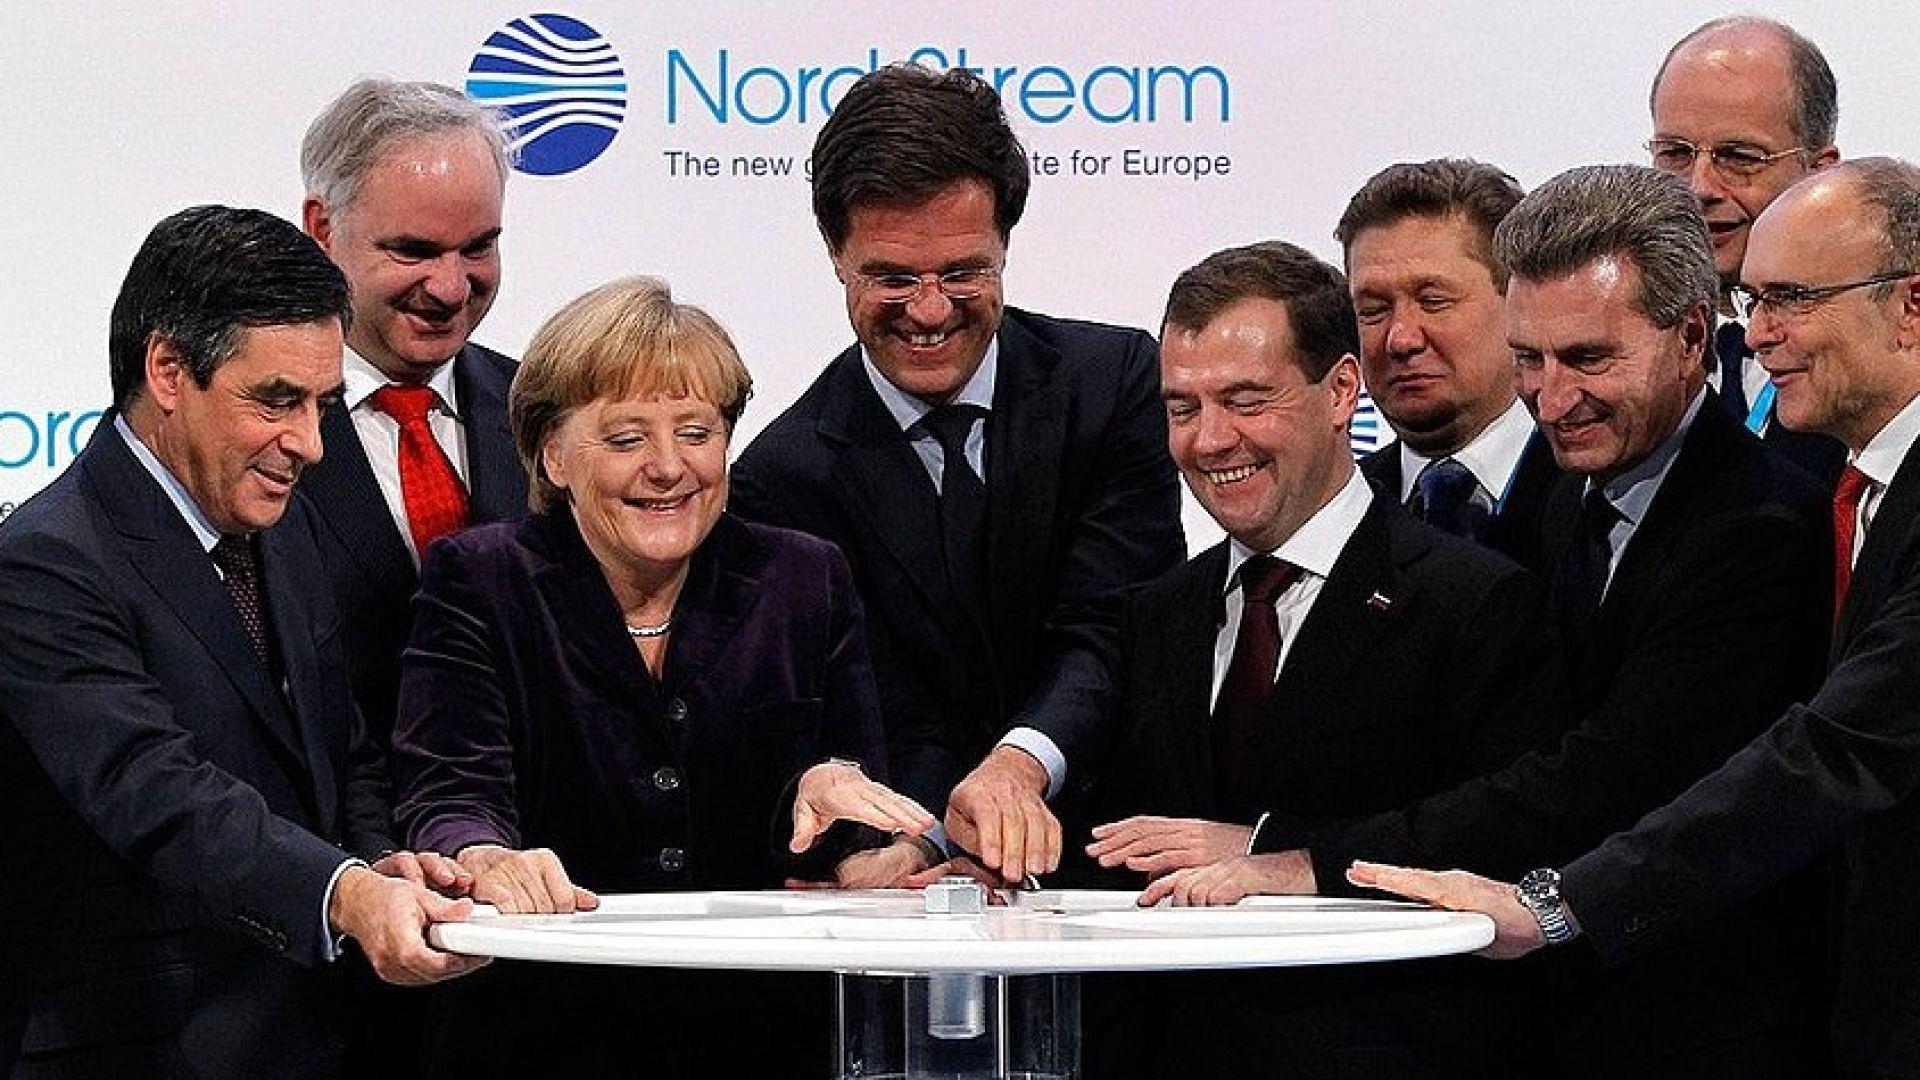 Заради Северен Поток-2 Европа готова да заобиколи санкциите